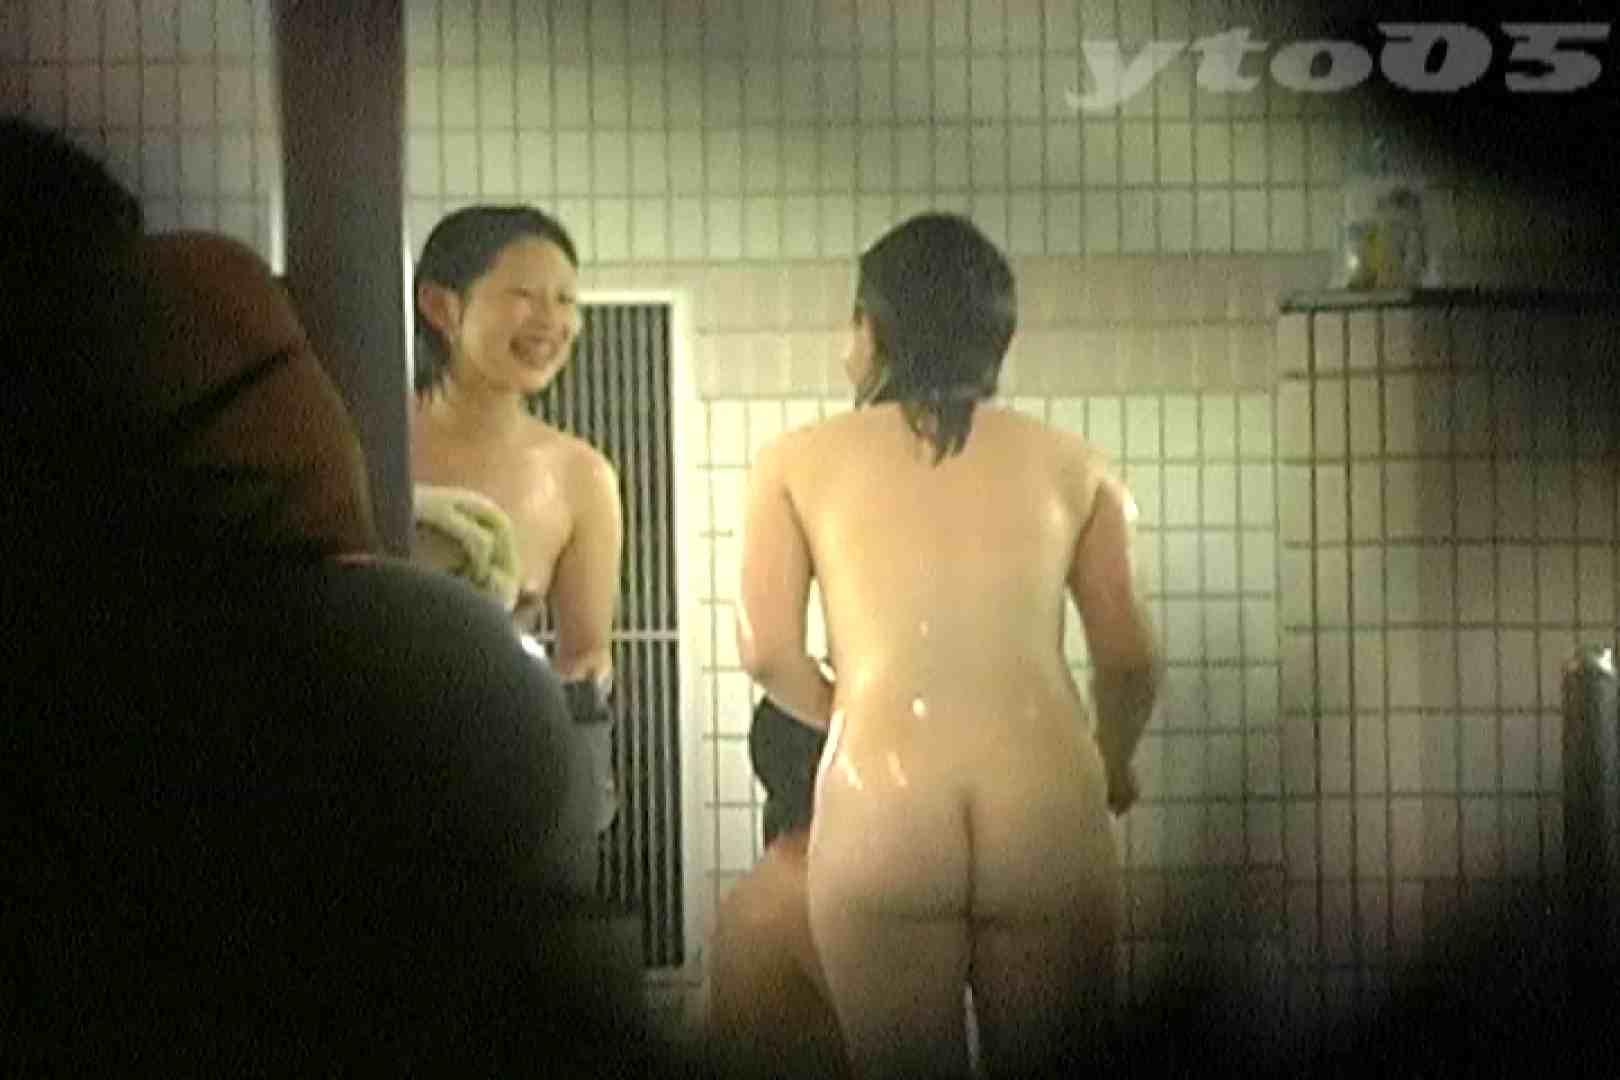 ▲復活限定▲合宿ホテル女風呂盗撮 Vol.28 OL | 合宿  38連発 18